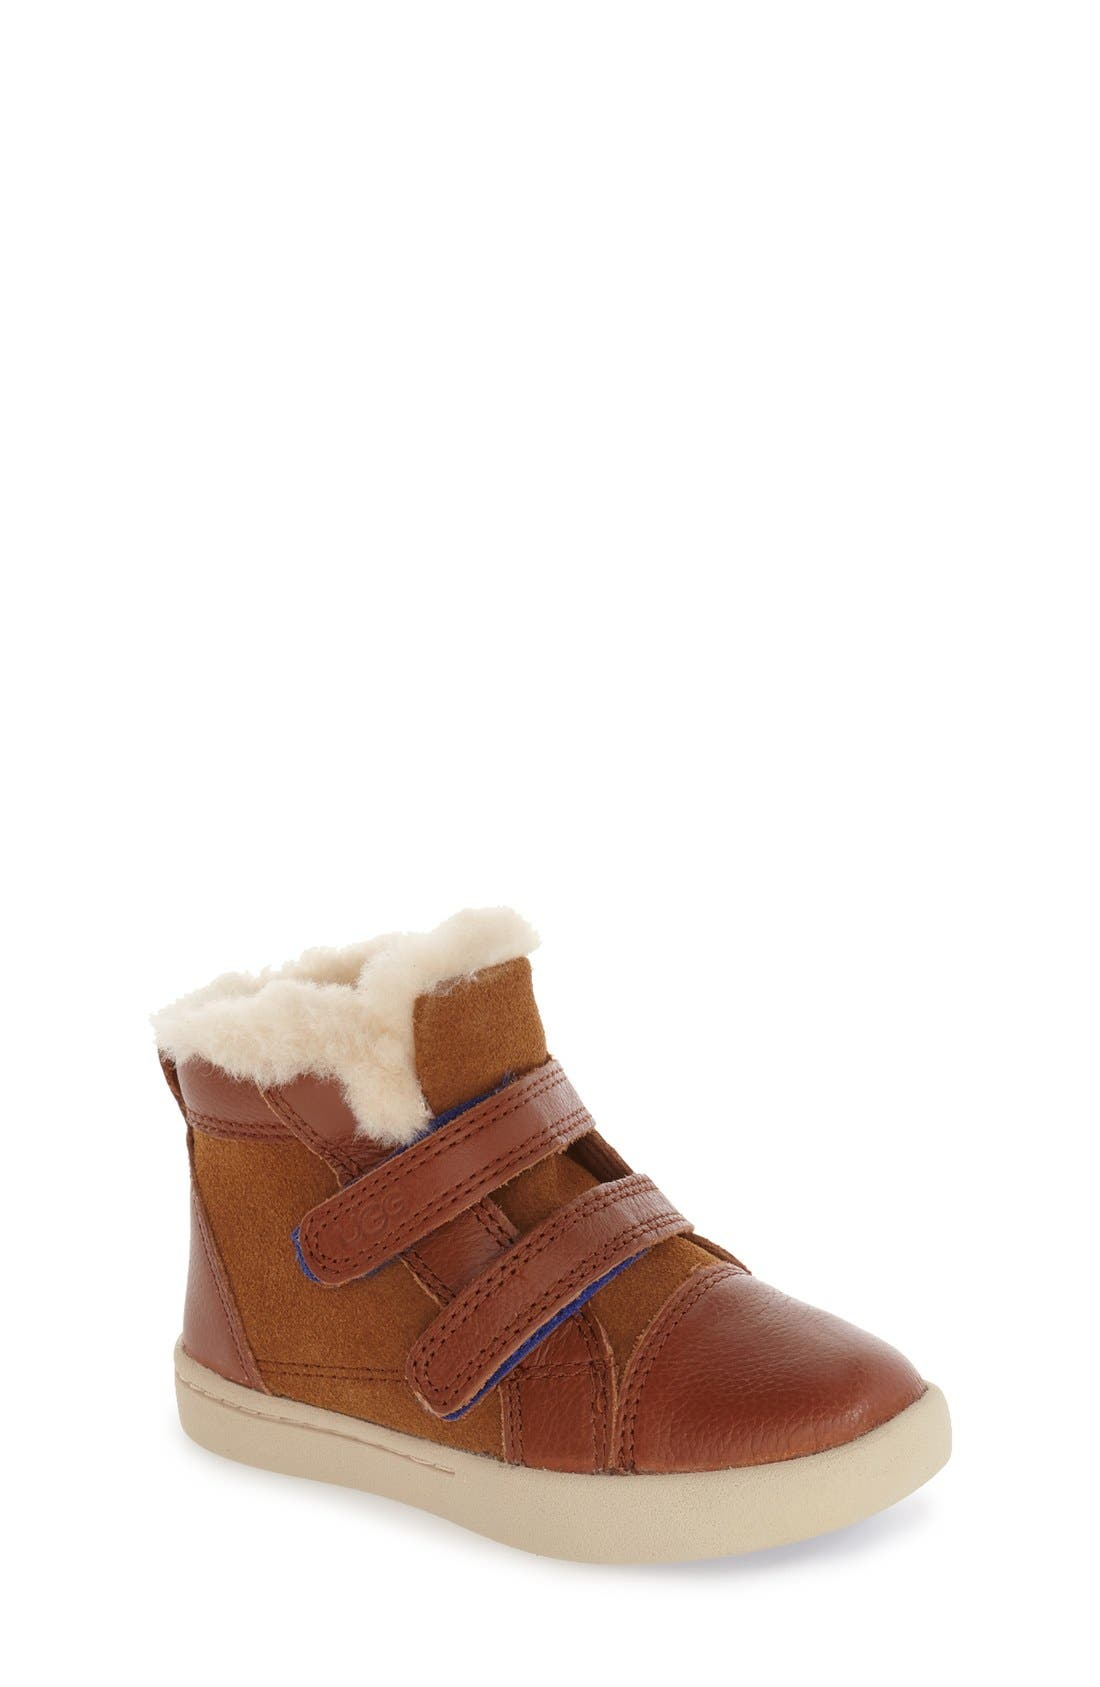 Alternate Image 1 Selected - UGG® Rennon High Top Sneaker (Walker & Toddler)